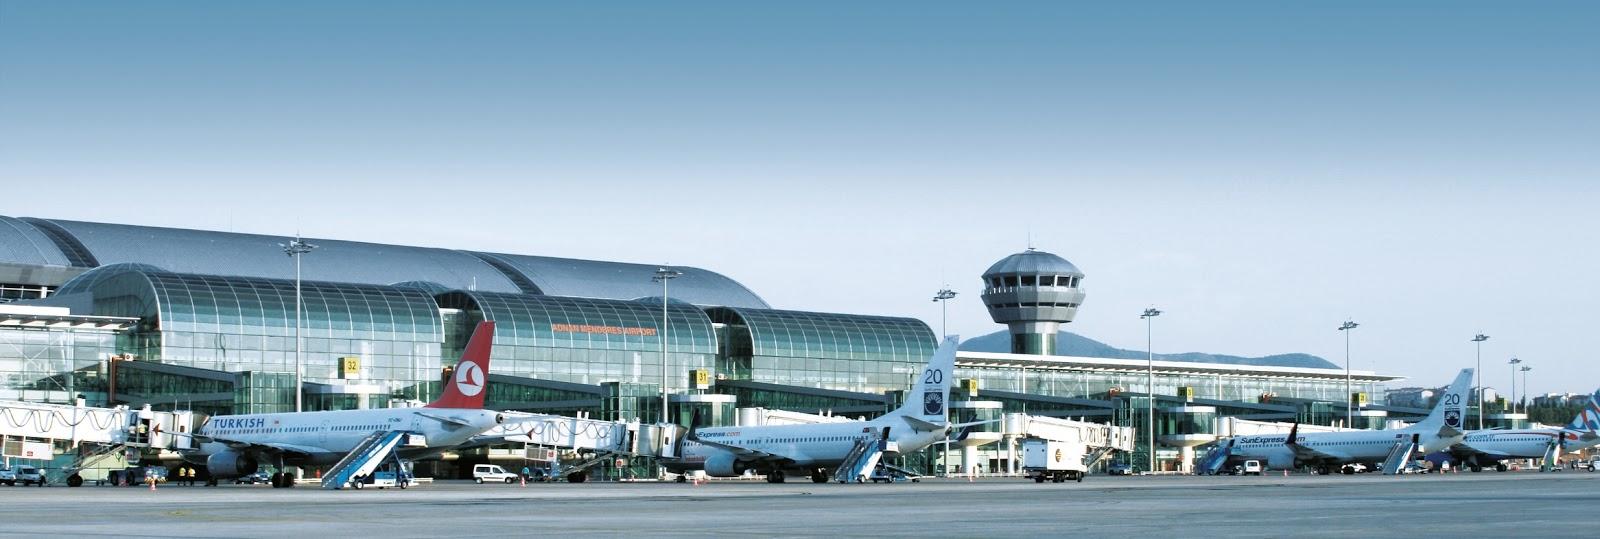 Izmir Adnan Menderes Havalimani Airport